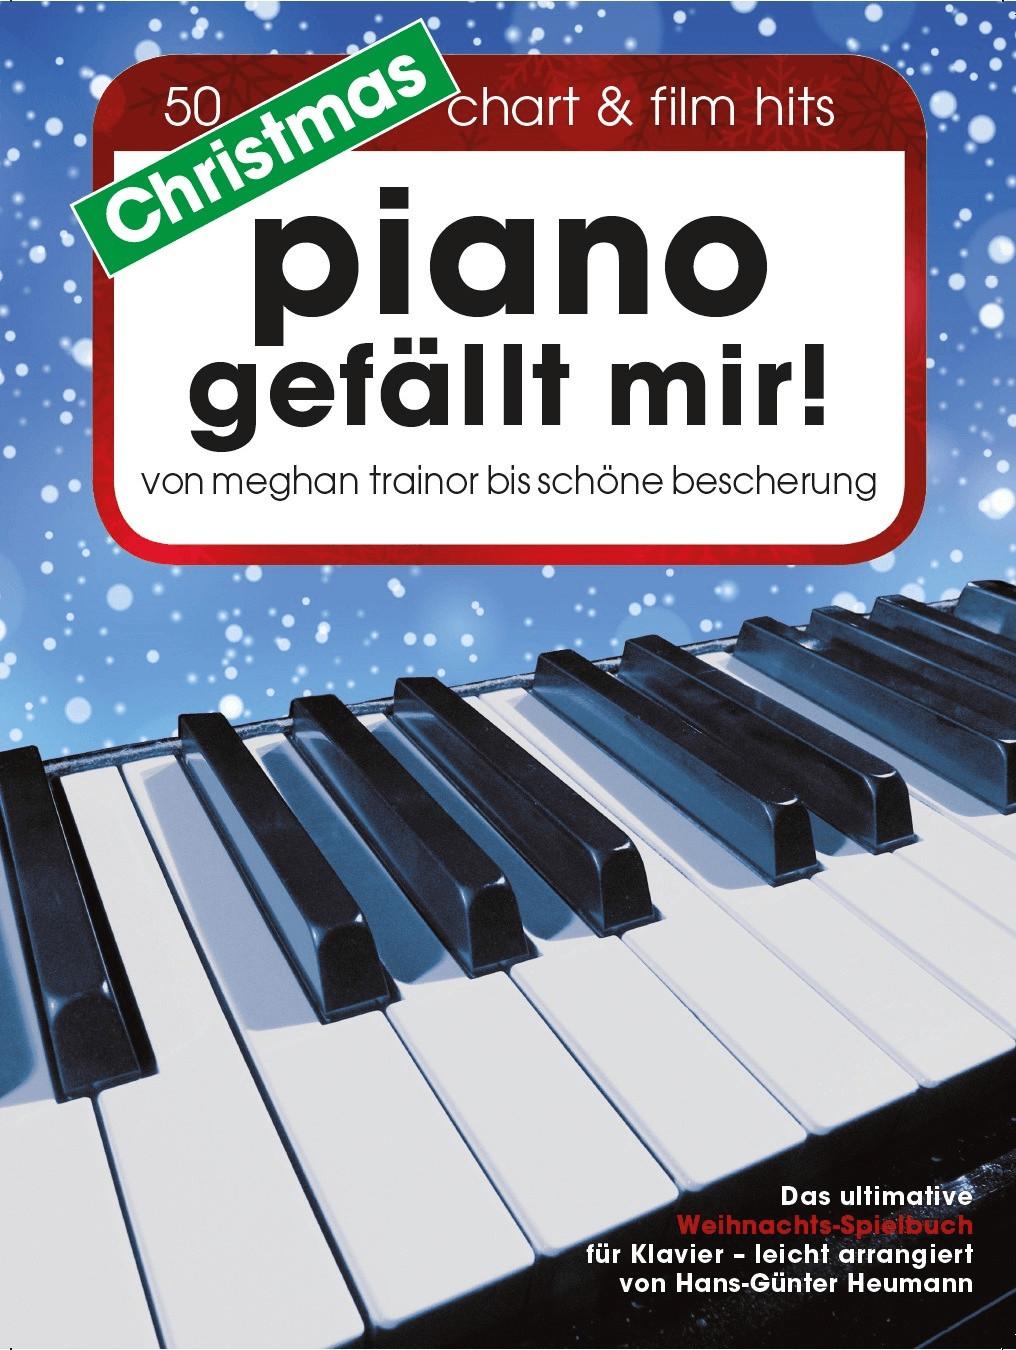 Bosworth Christmas Piano gefällt mir! 50 Chart und Film Hits